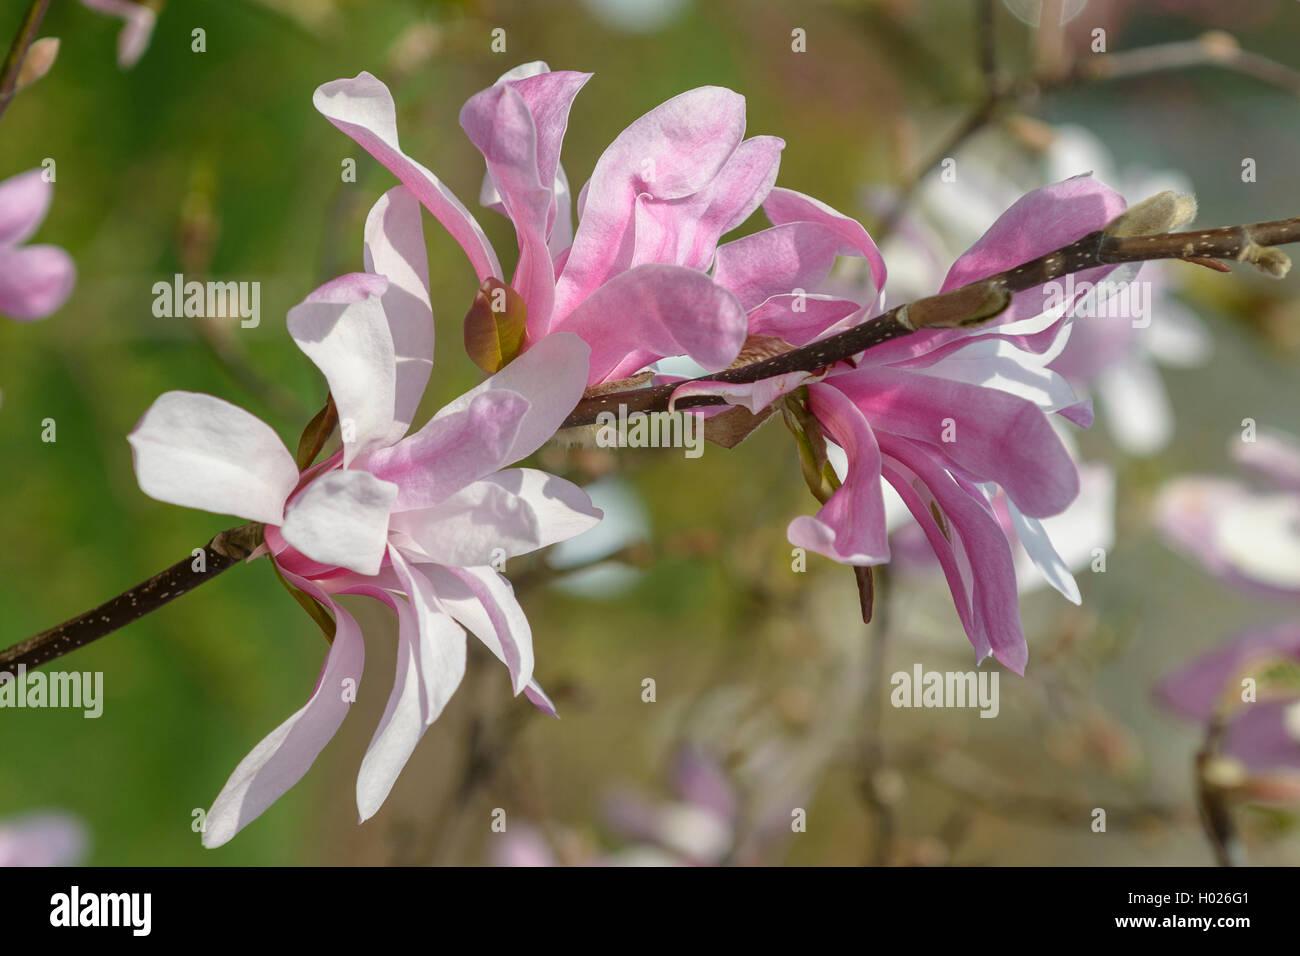 magnolia (Magnolia x loebneri 'Leonard Messel', Magnolia x loebneri Leonard Messel), cultivar Leonard Messel Stock Photo